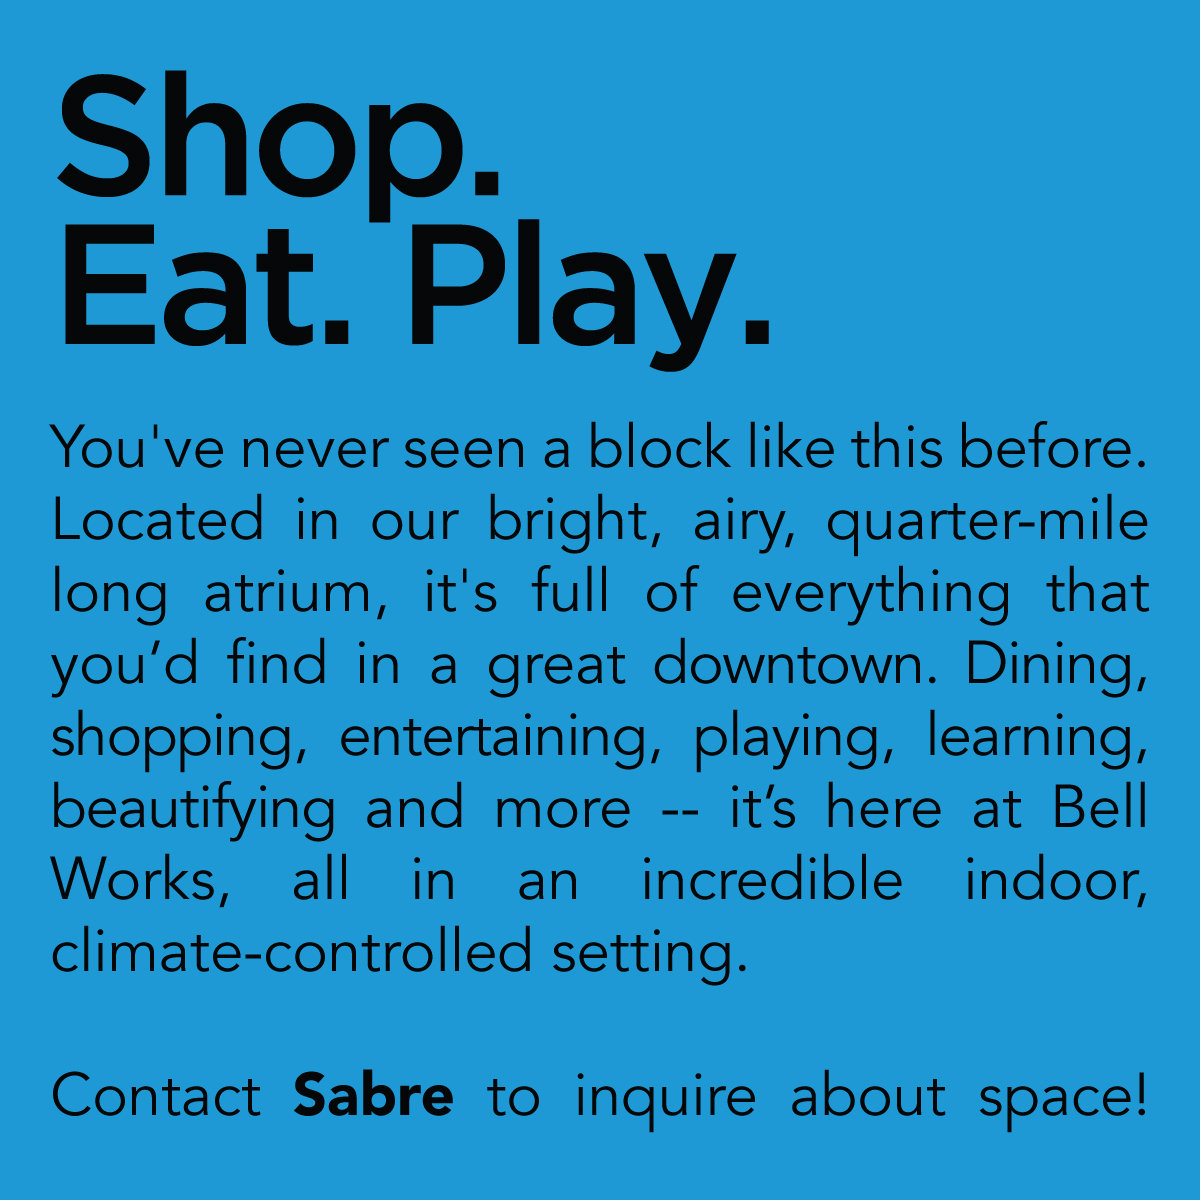 Shop. Eat. Play.